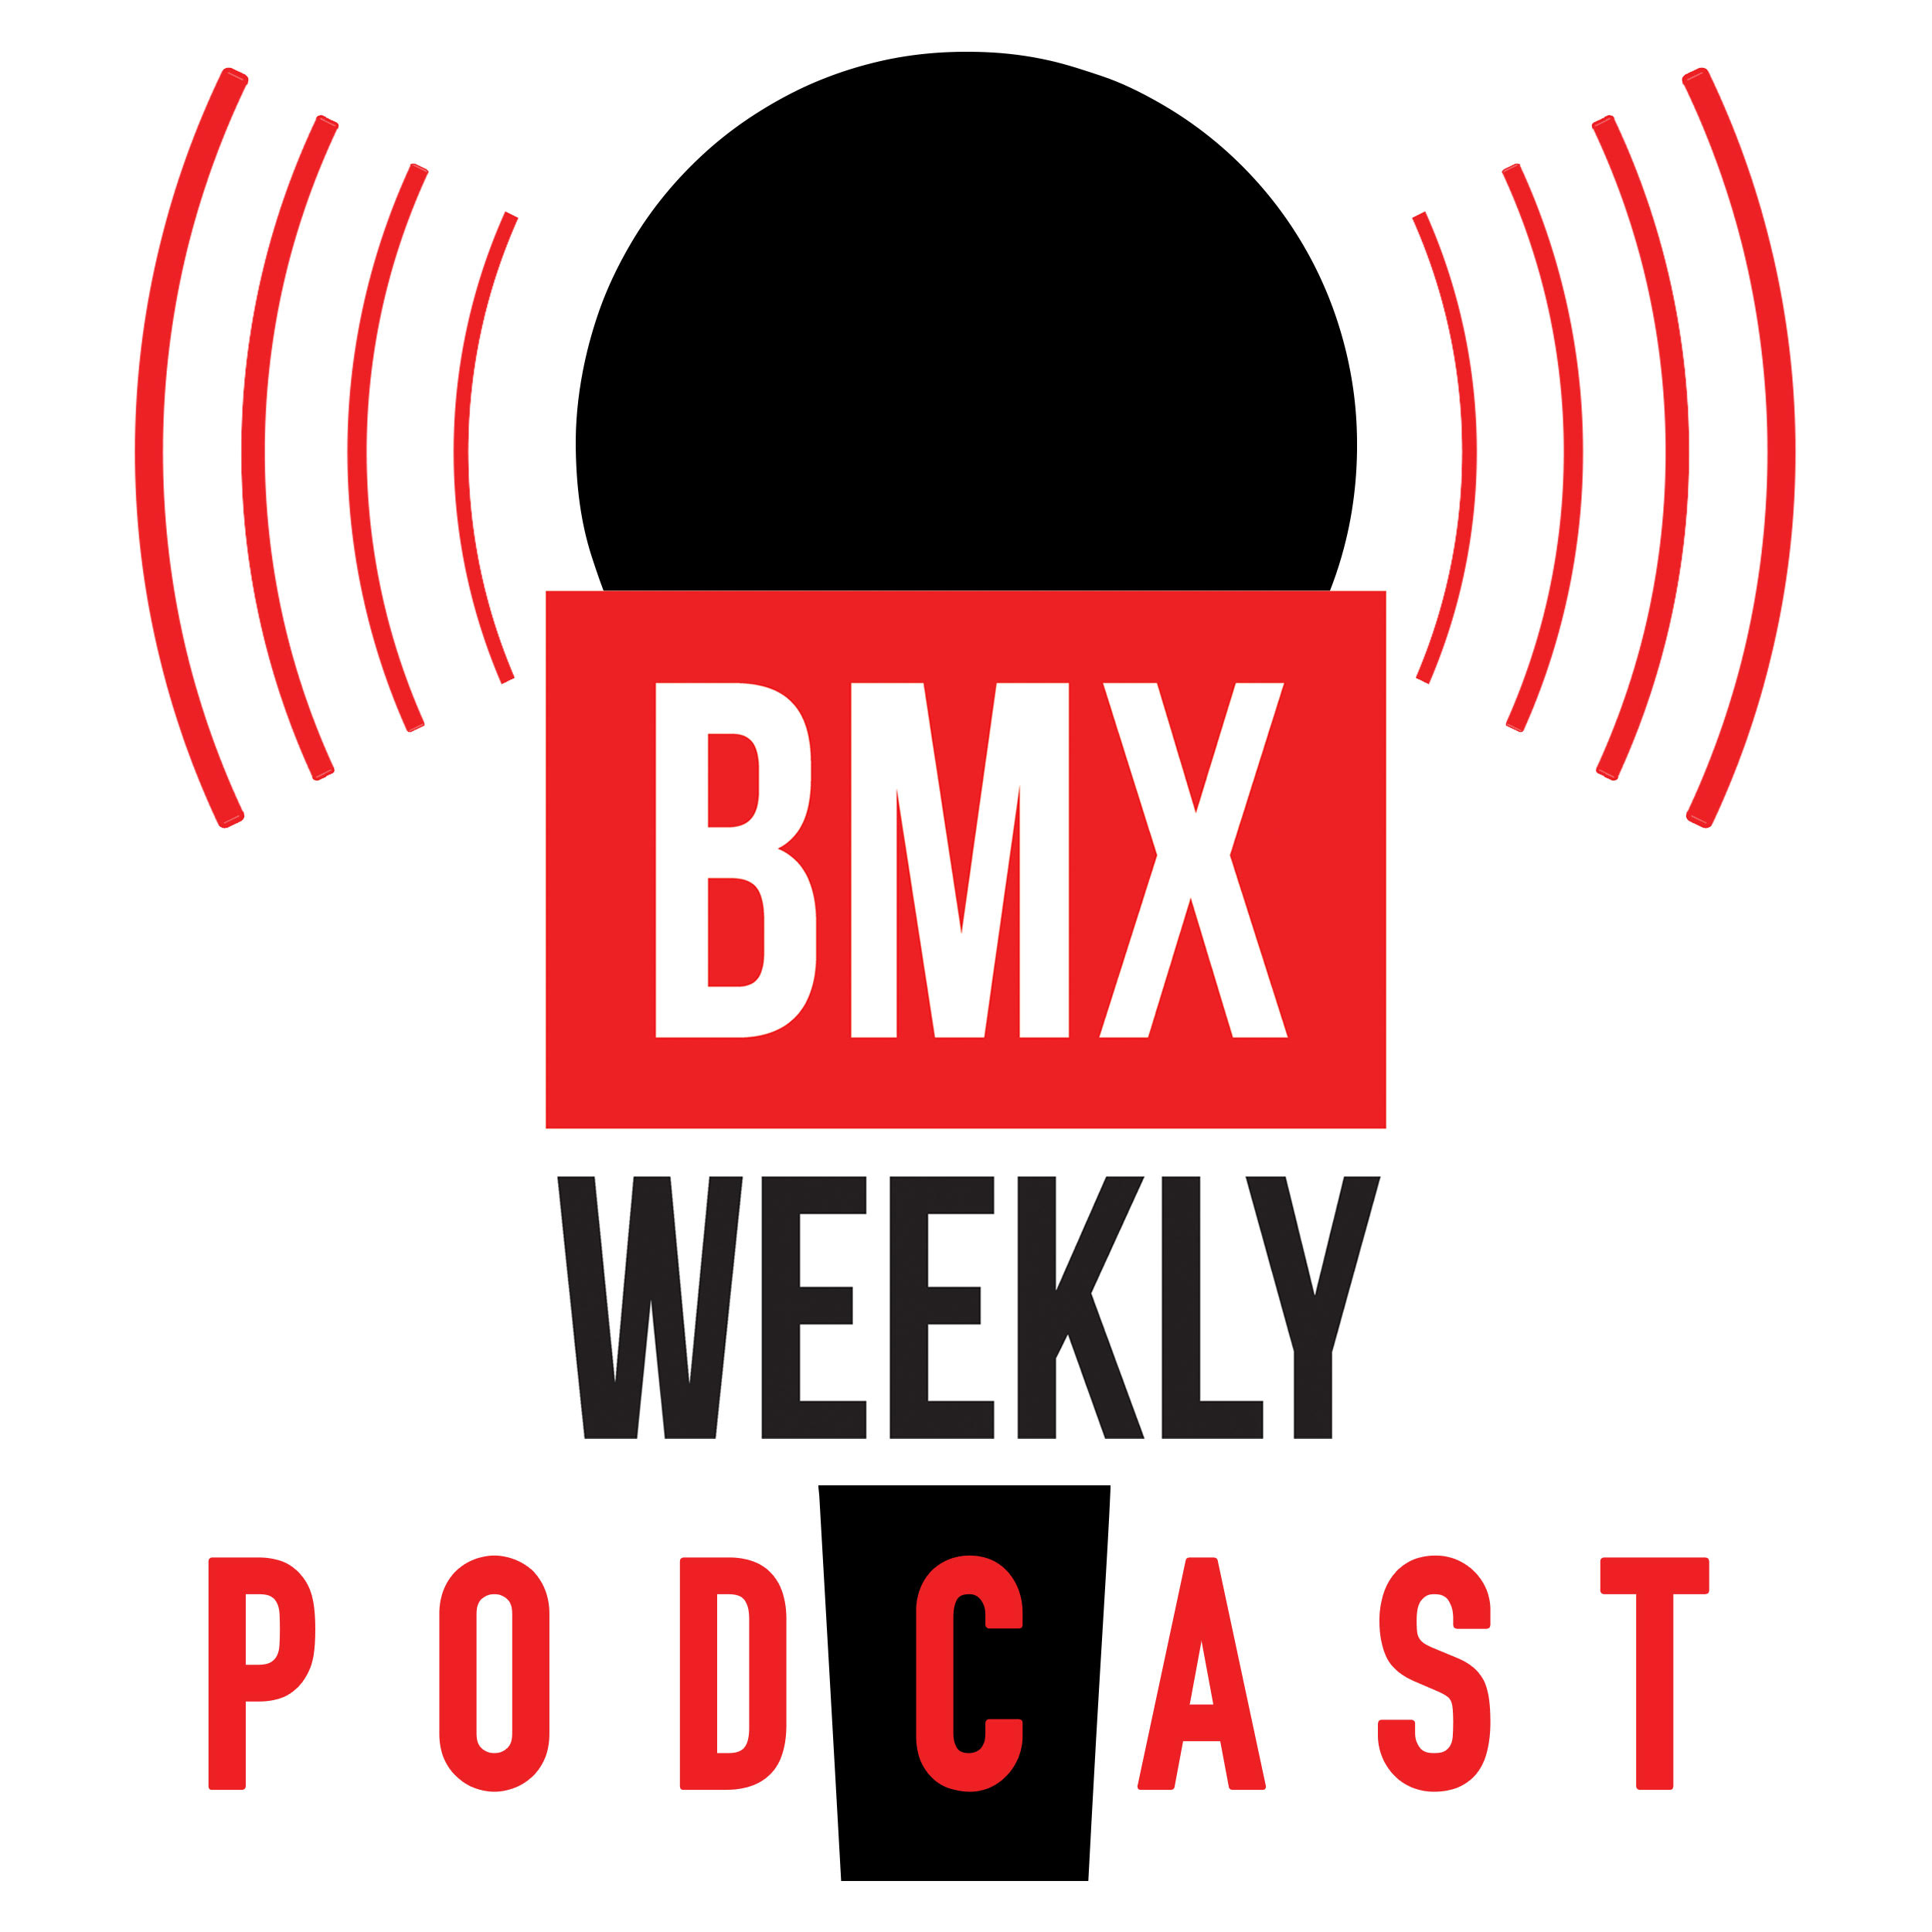 BMX Weekly